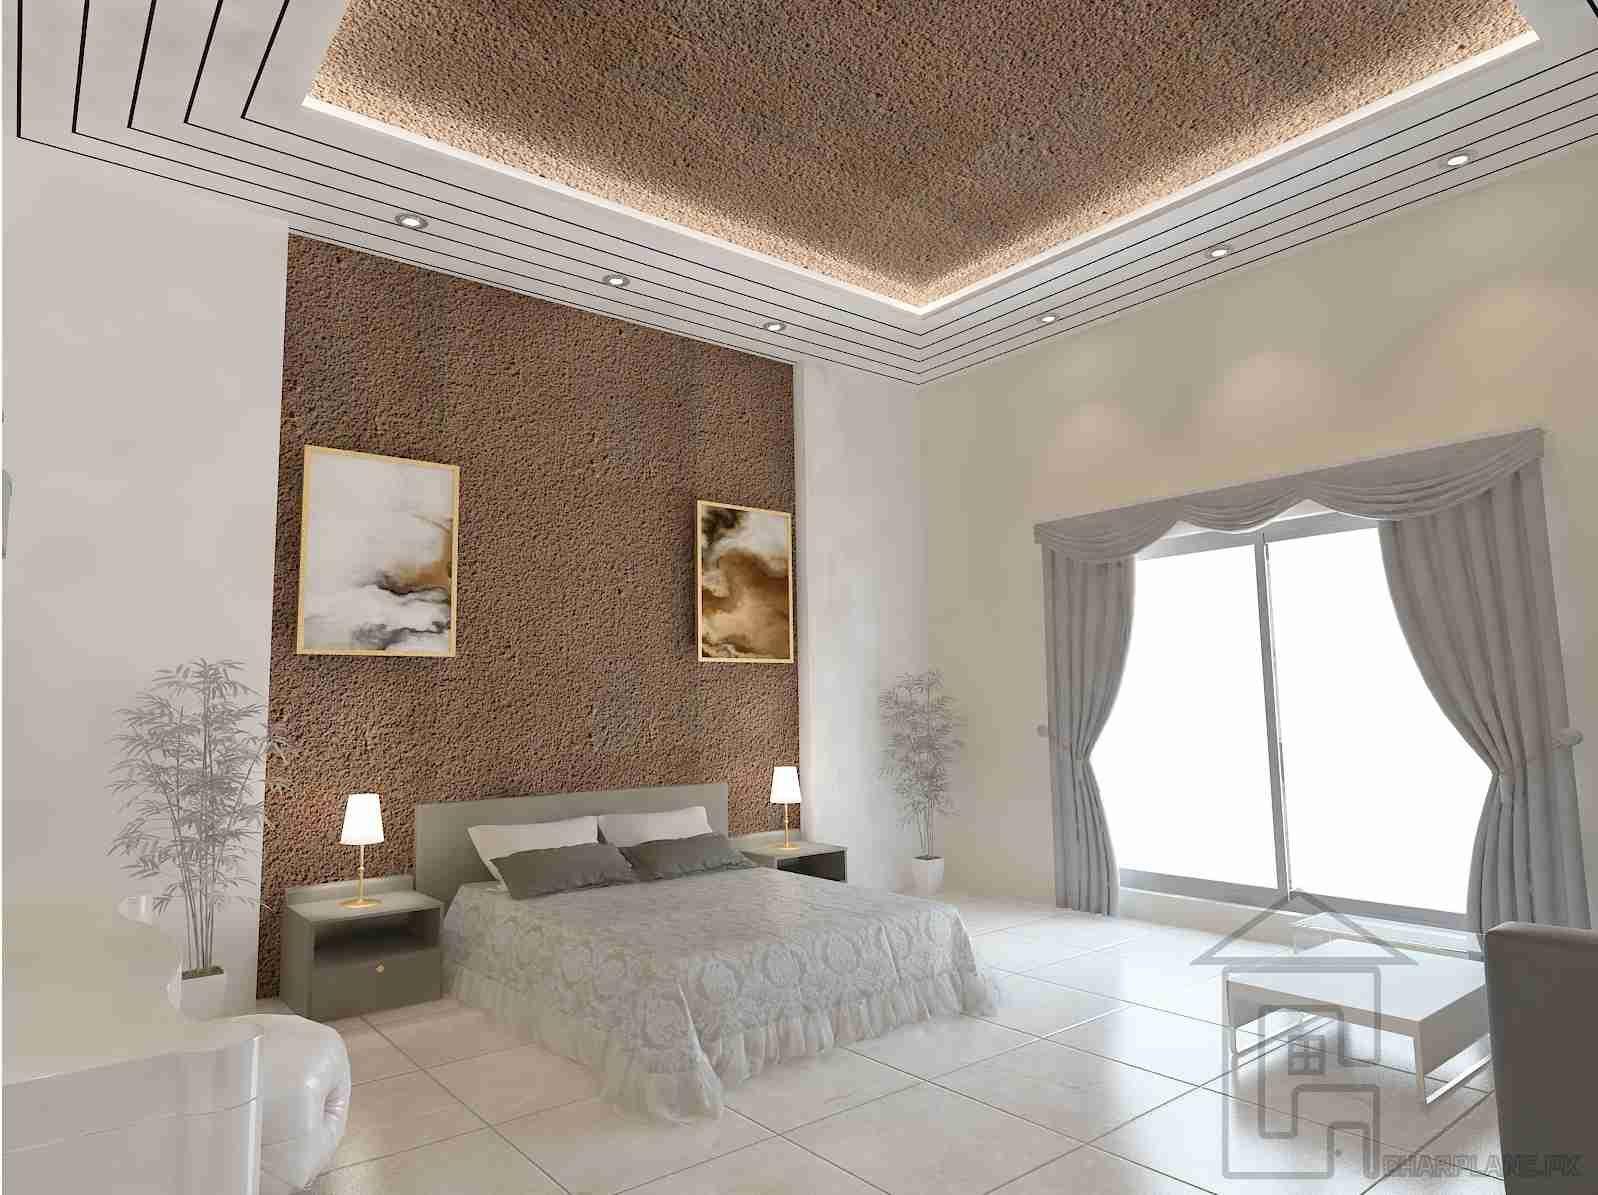 Ceiling Design Of Bedroom In Islamabad Ceiling Design Ceiling Design Bedroom House Design Kitchen